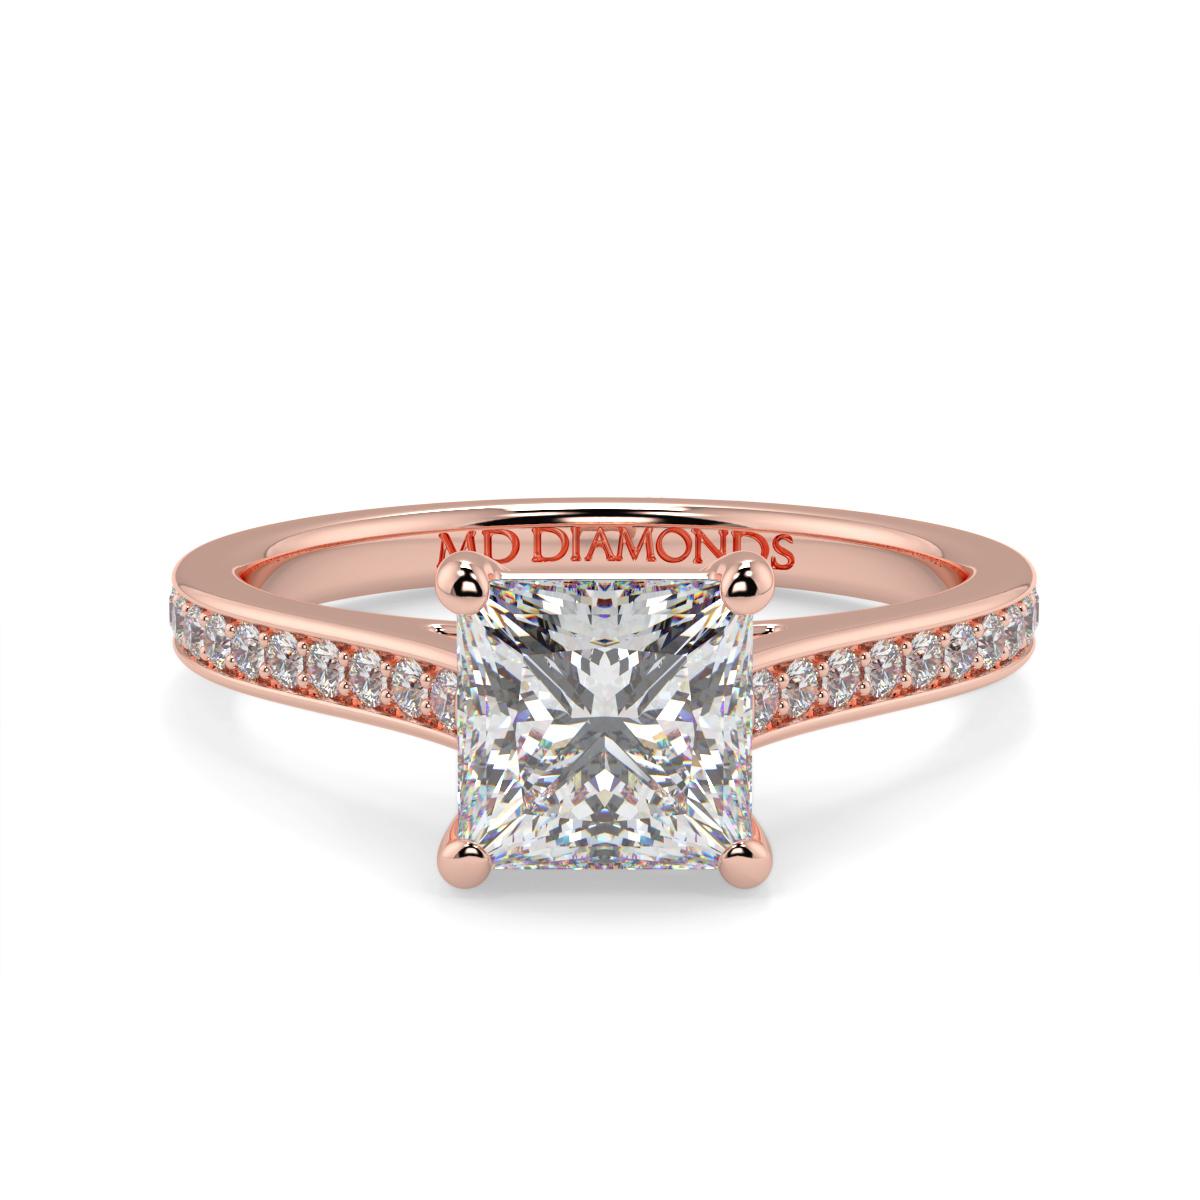 Princess Pave Set Wed Fit Diamond Ring